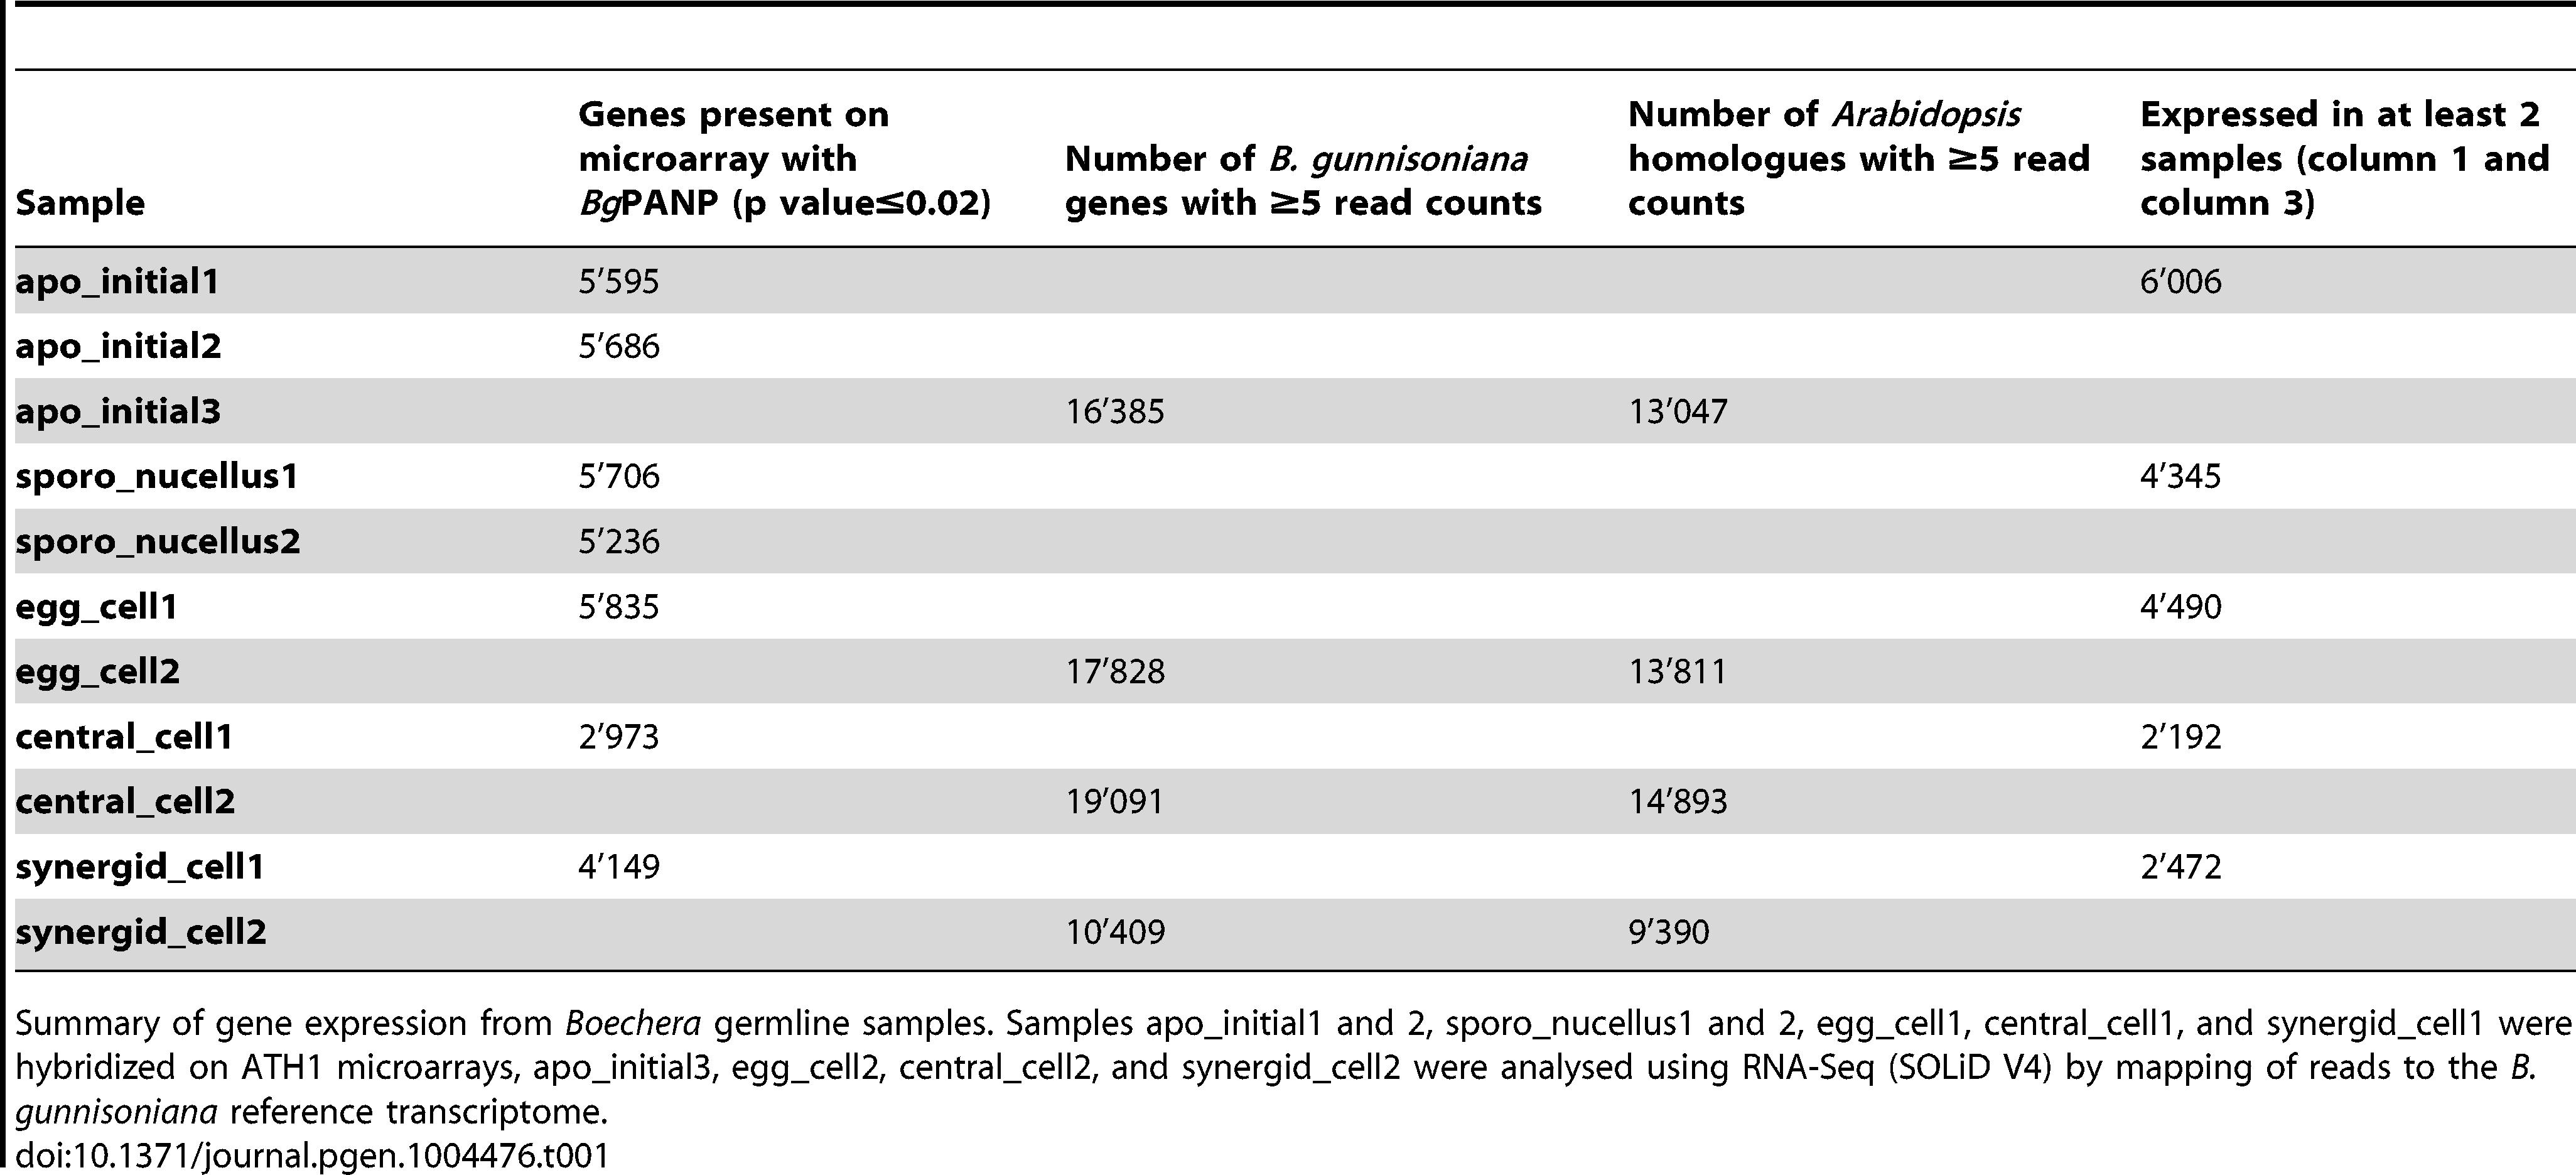 Transcriptome analysis of 11 samples from apomictic <i>Boechera</i> isolated by LAM.